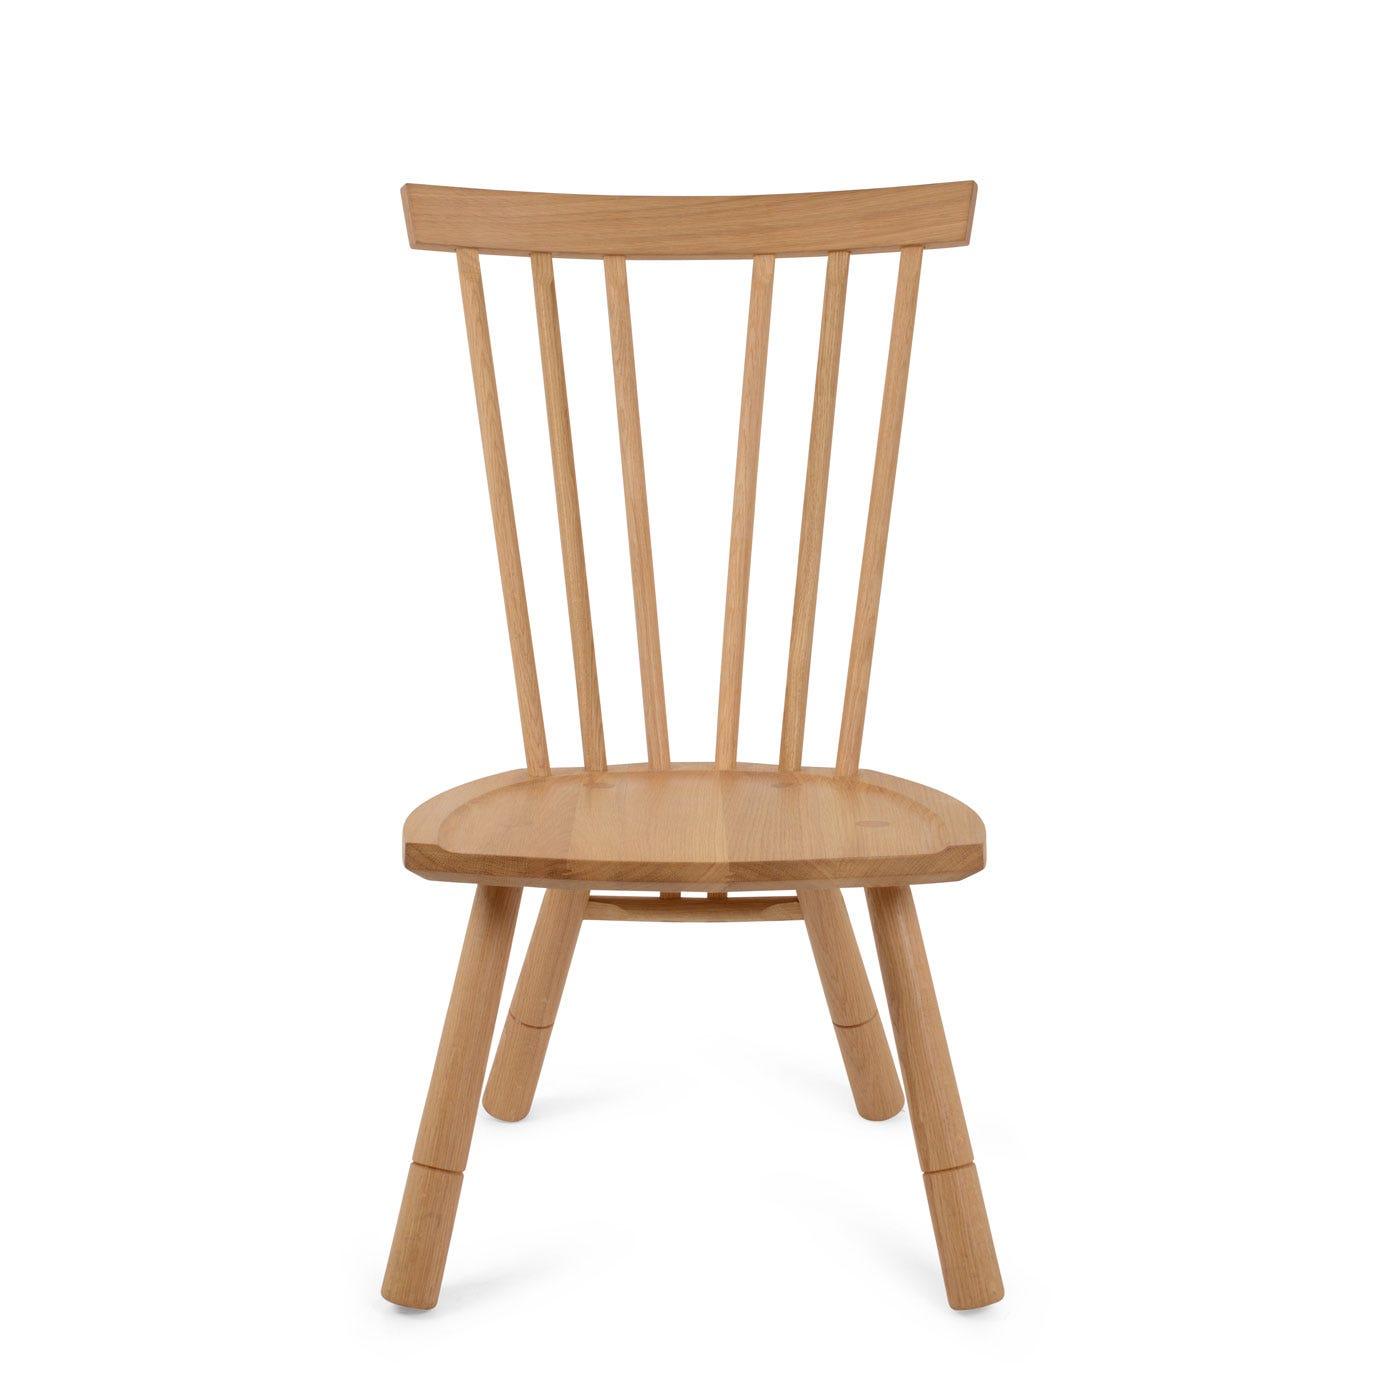 Whitstable Fireside Chair